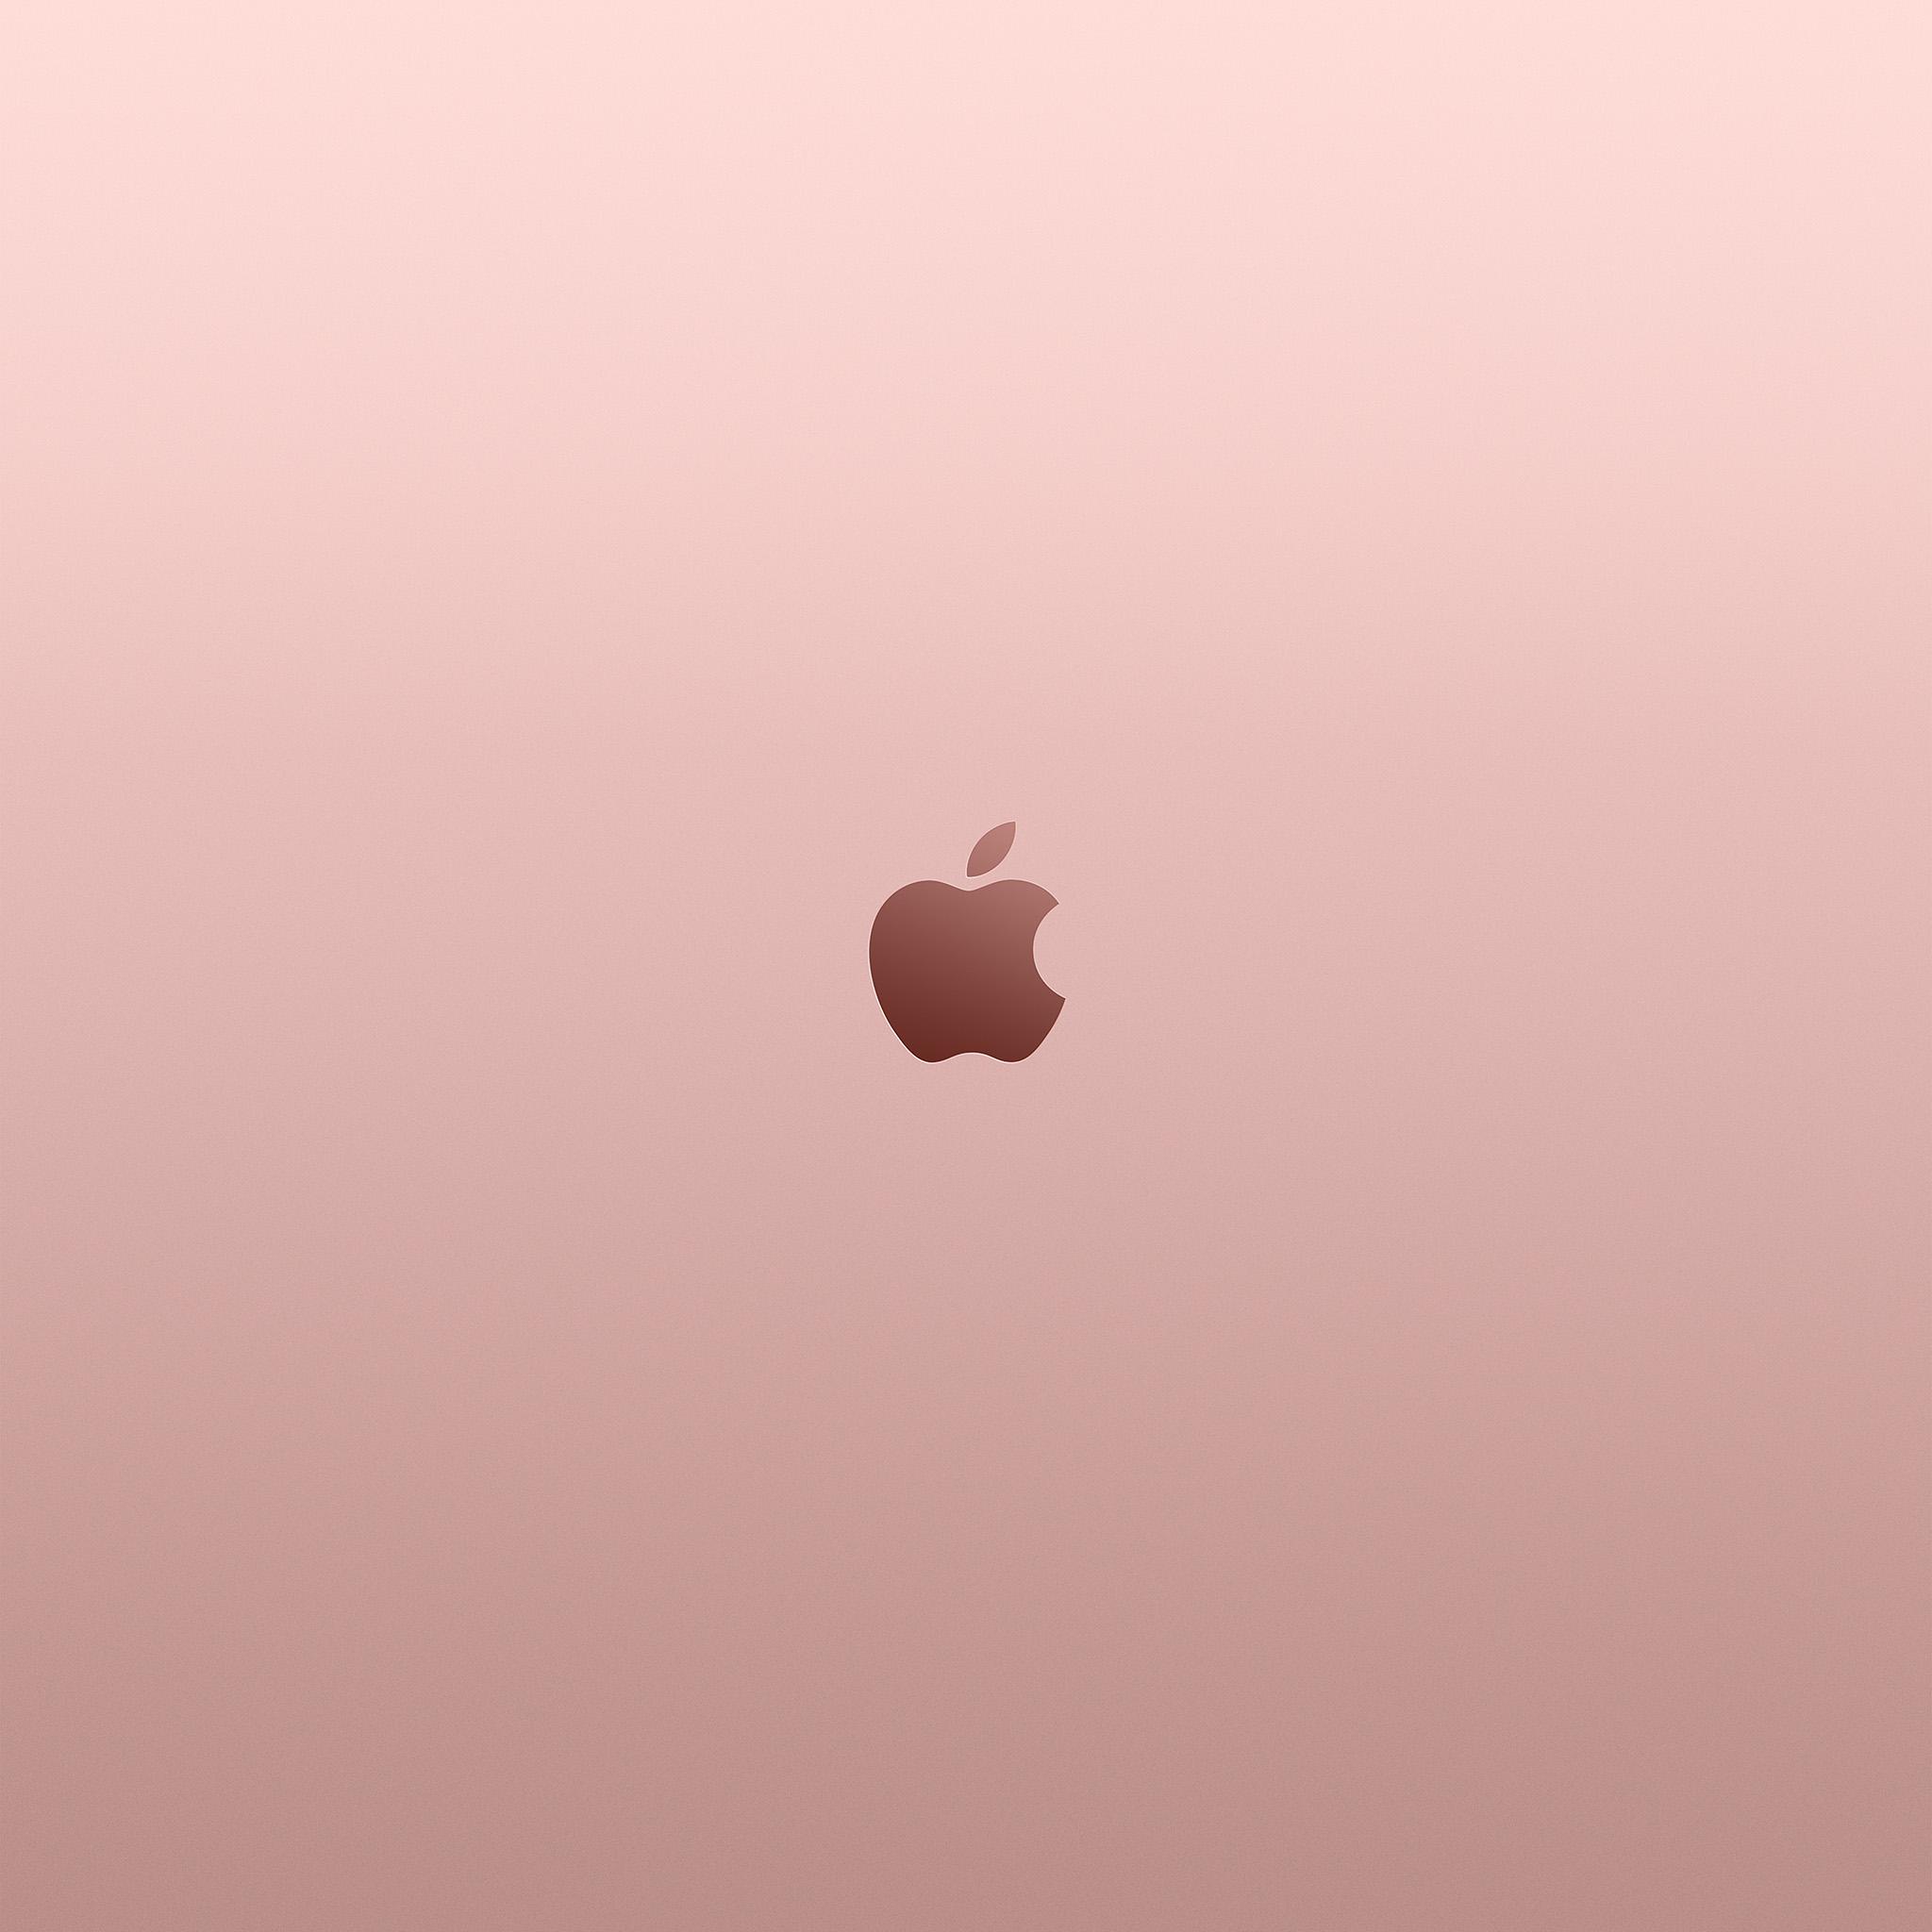 Au11 Apple Pink Rose Gold Minimal Illustration Art Wallpaper